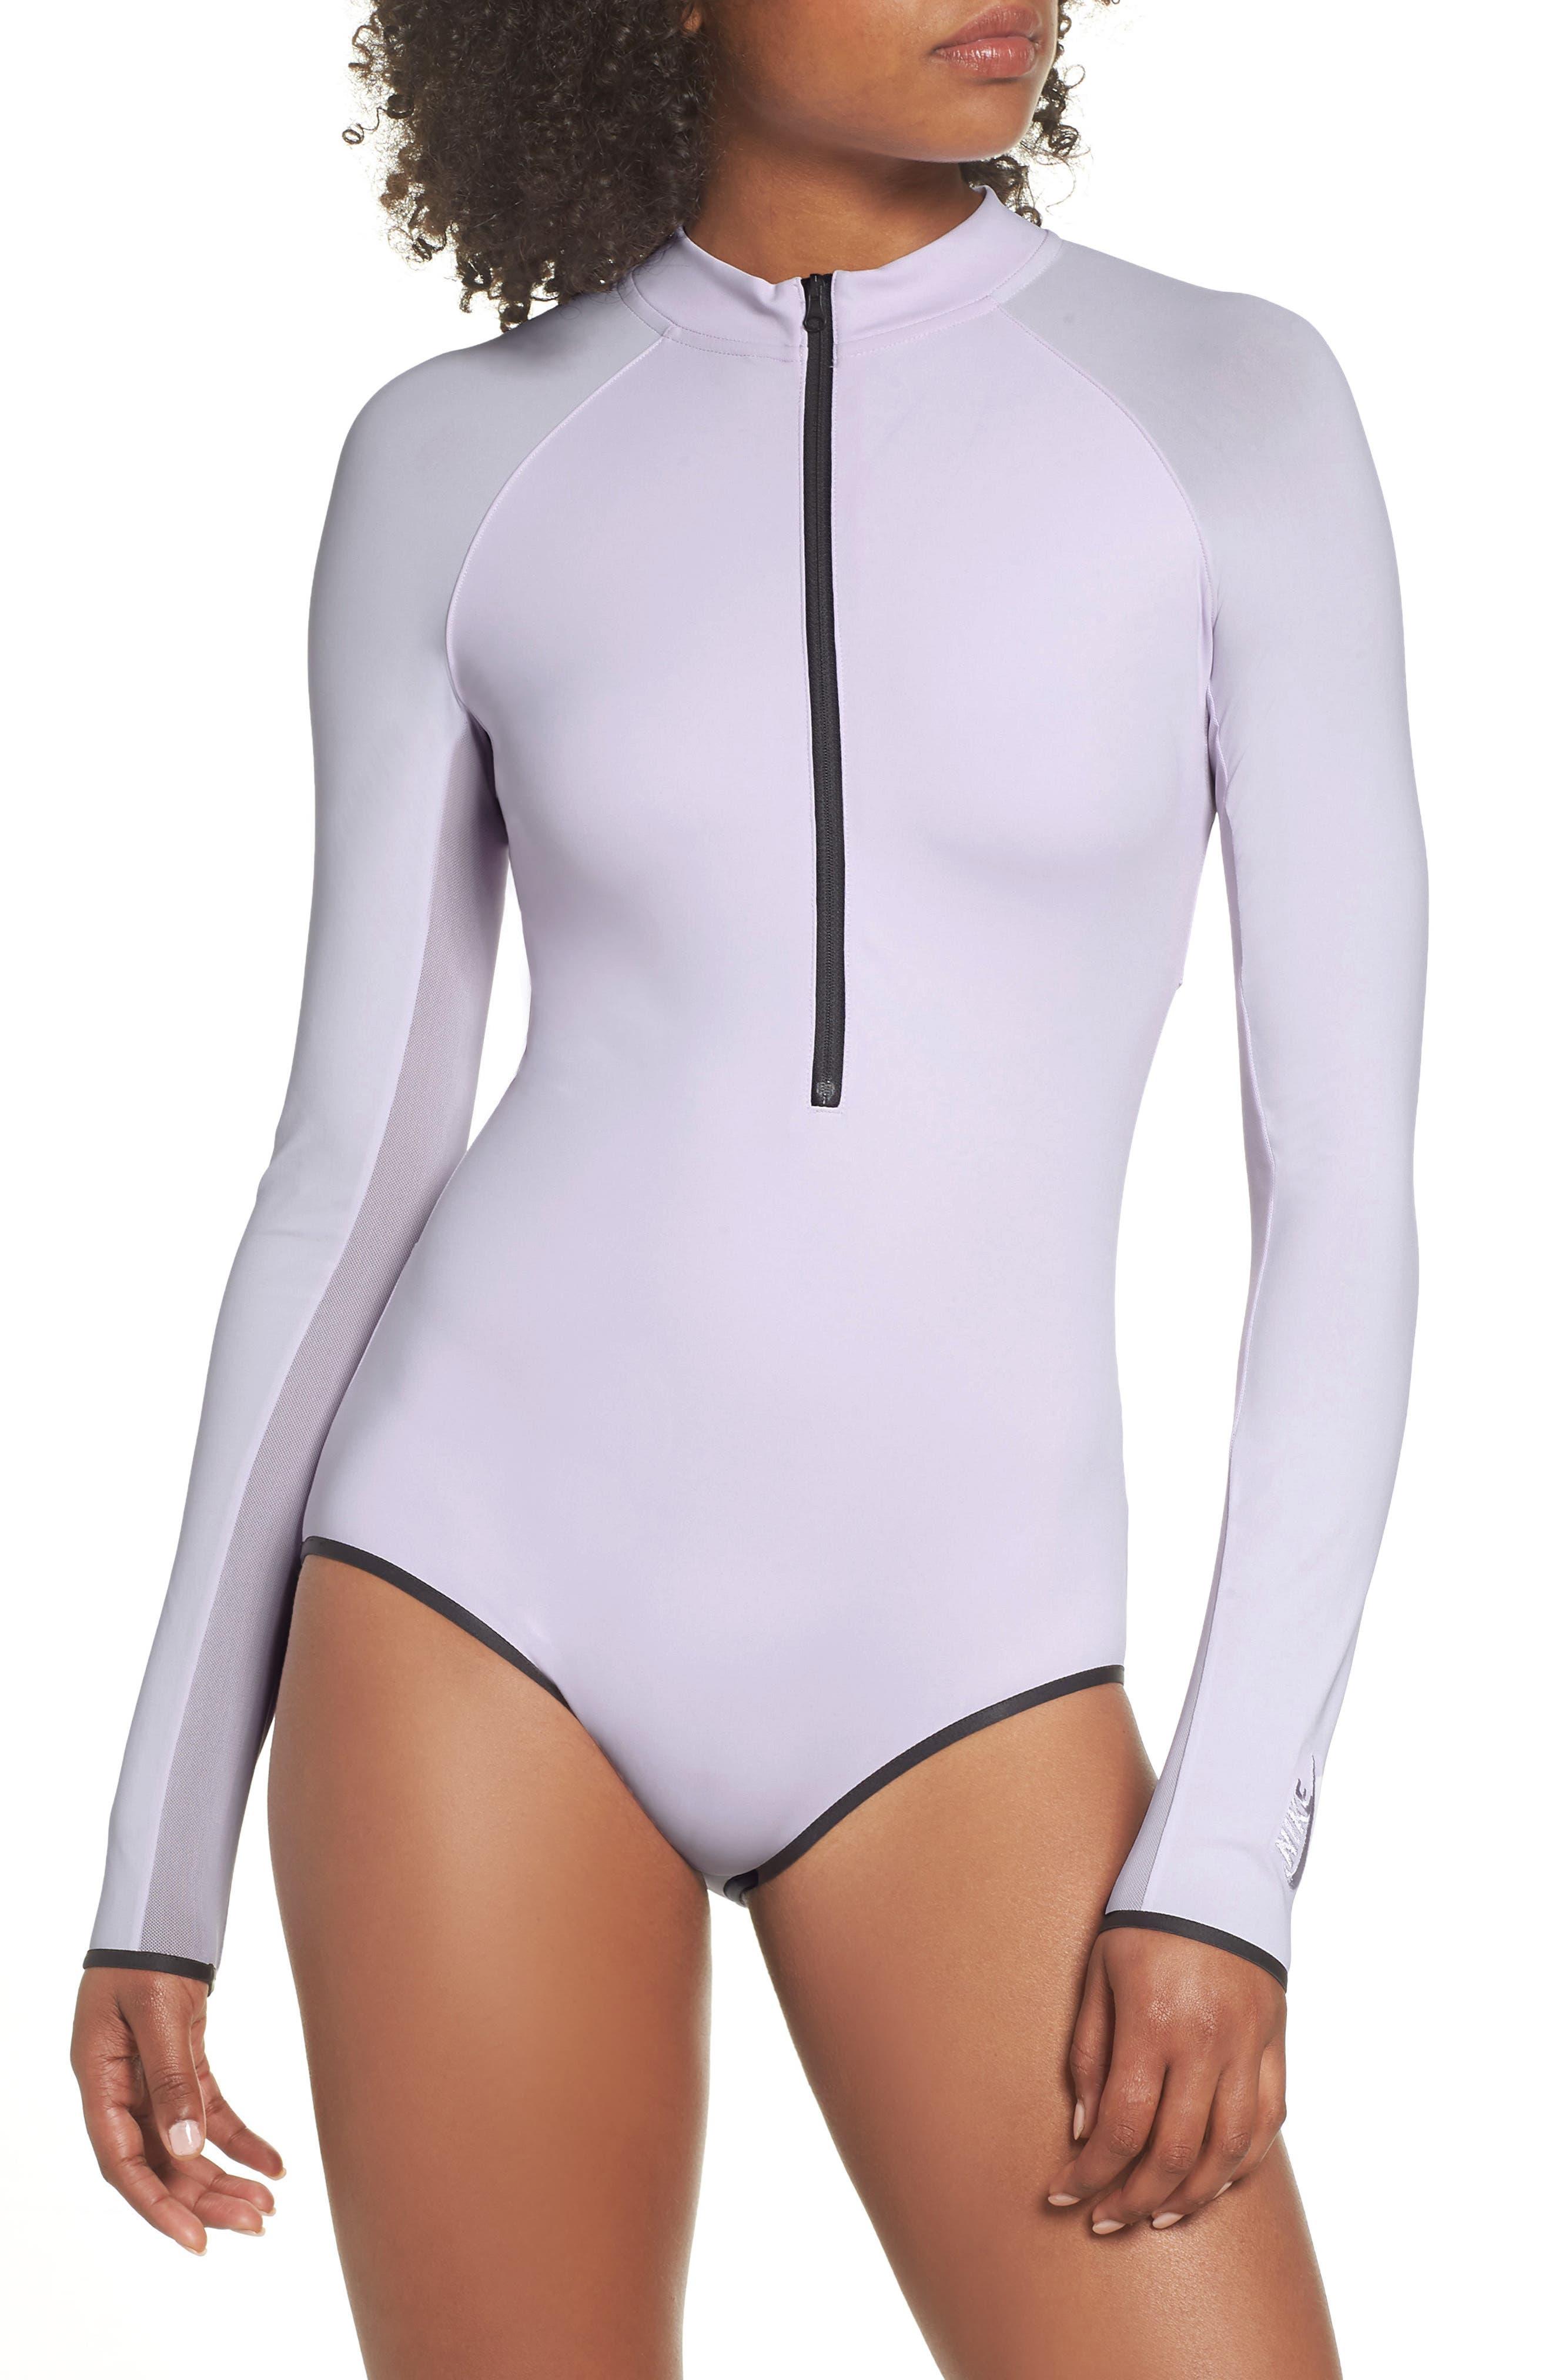 NRG Women's Dri-FIT Long Sleeve Bodysuit,                             Main thumbnail 1, color,                             509